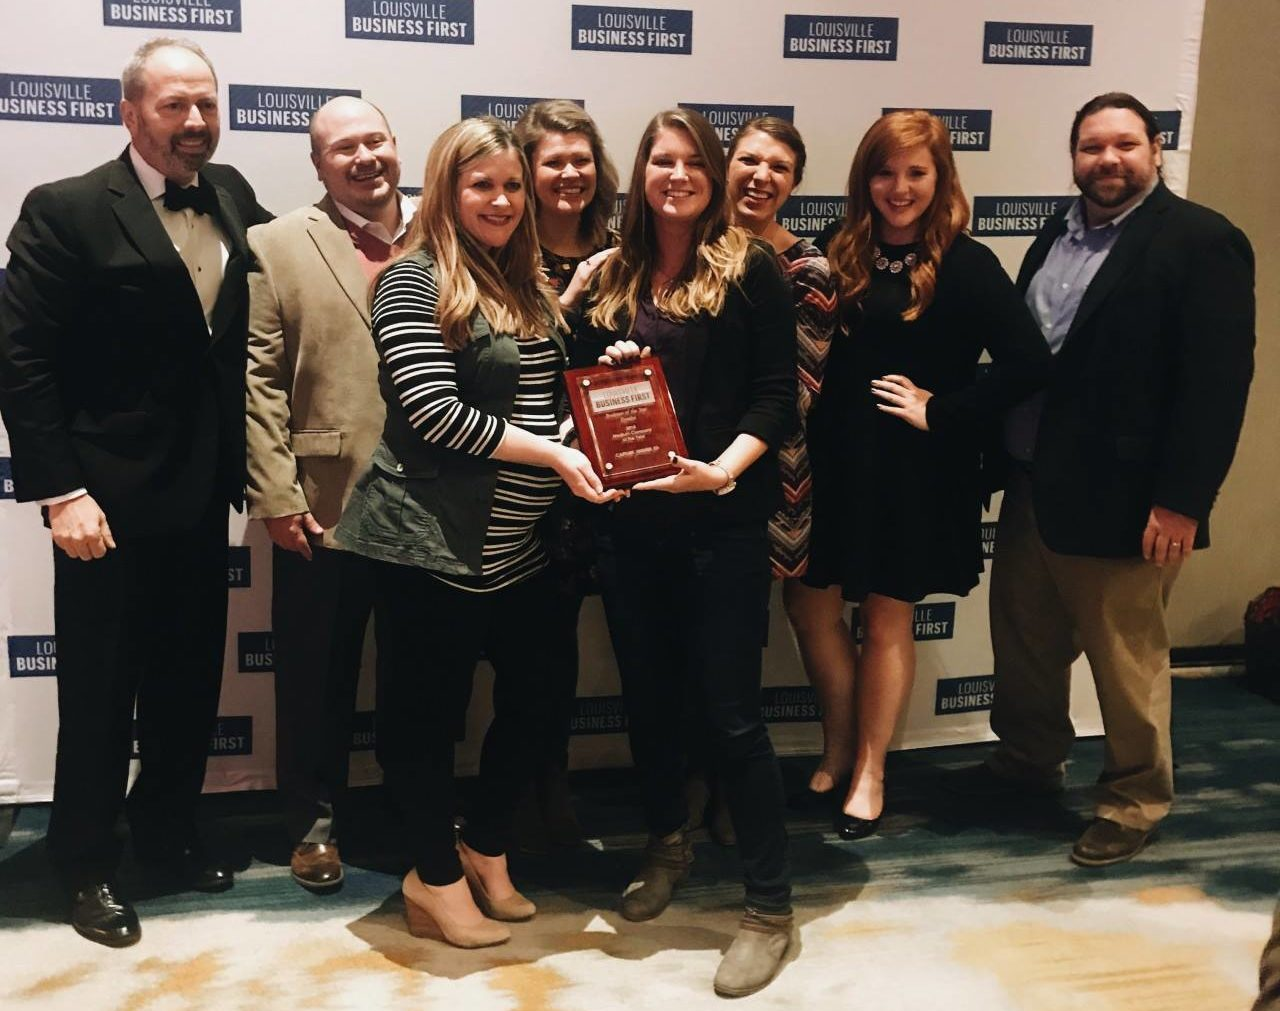 capture at Louisville Business First Award